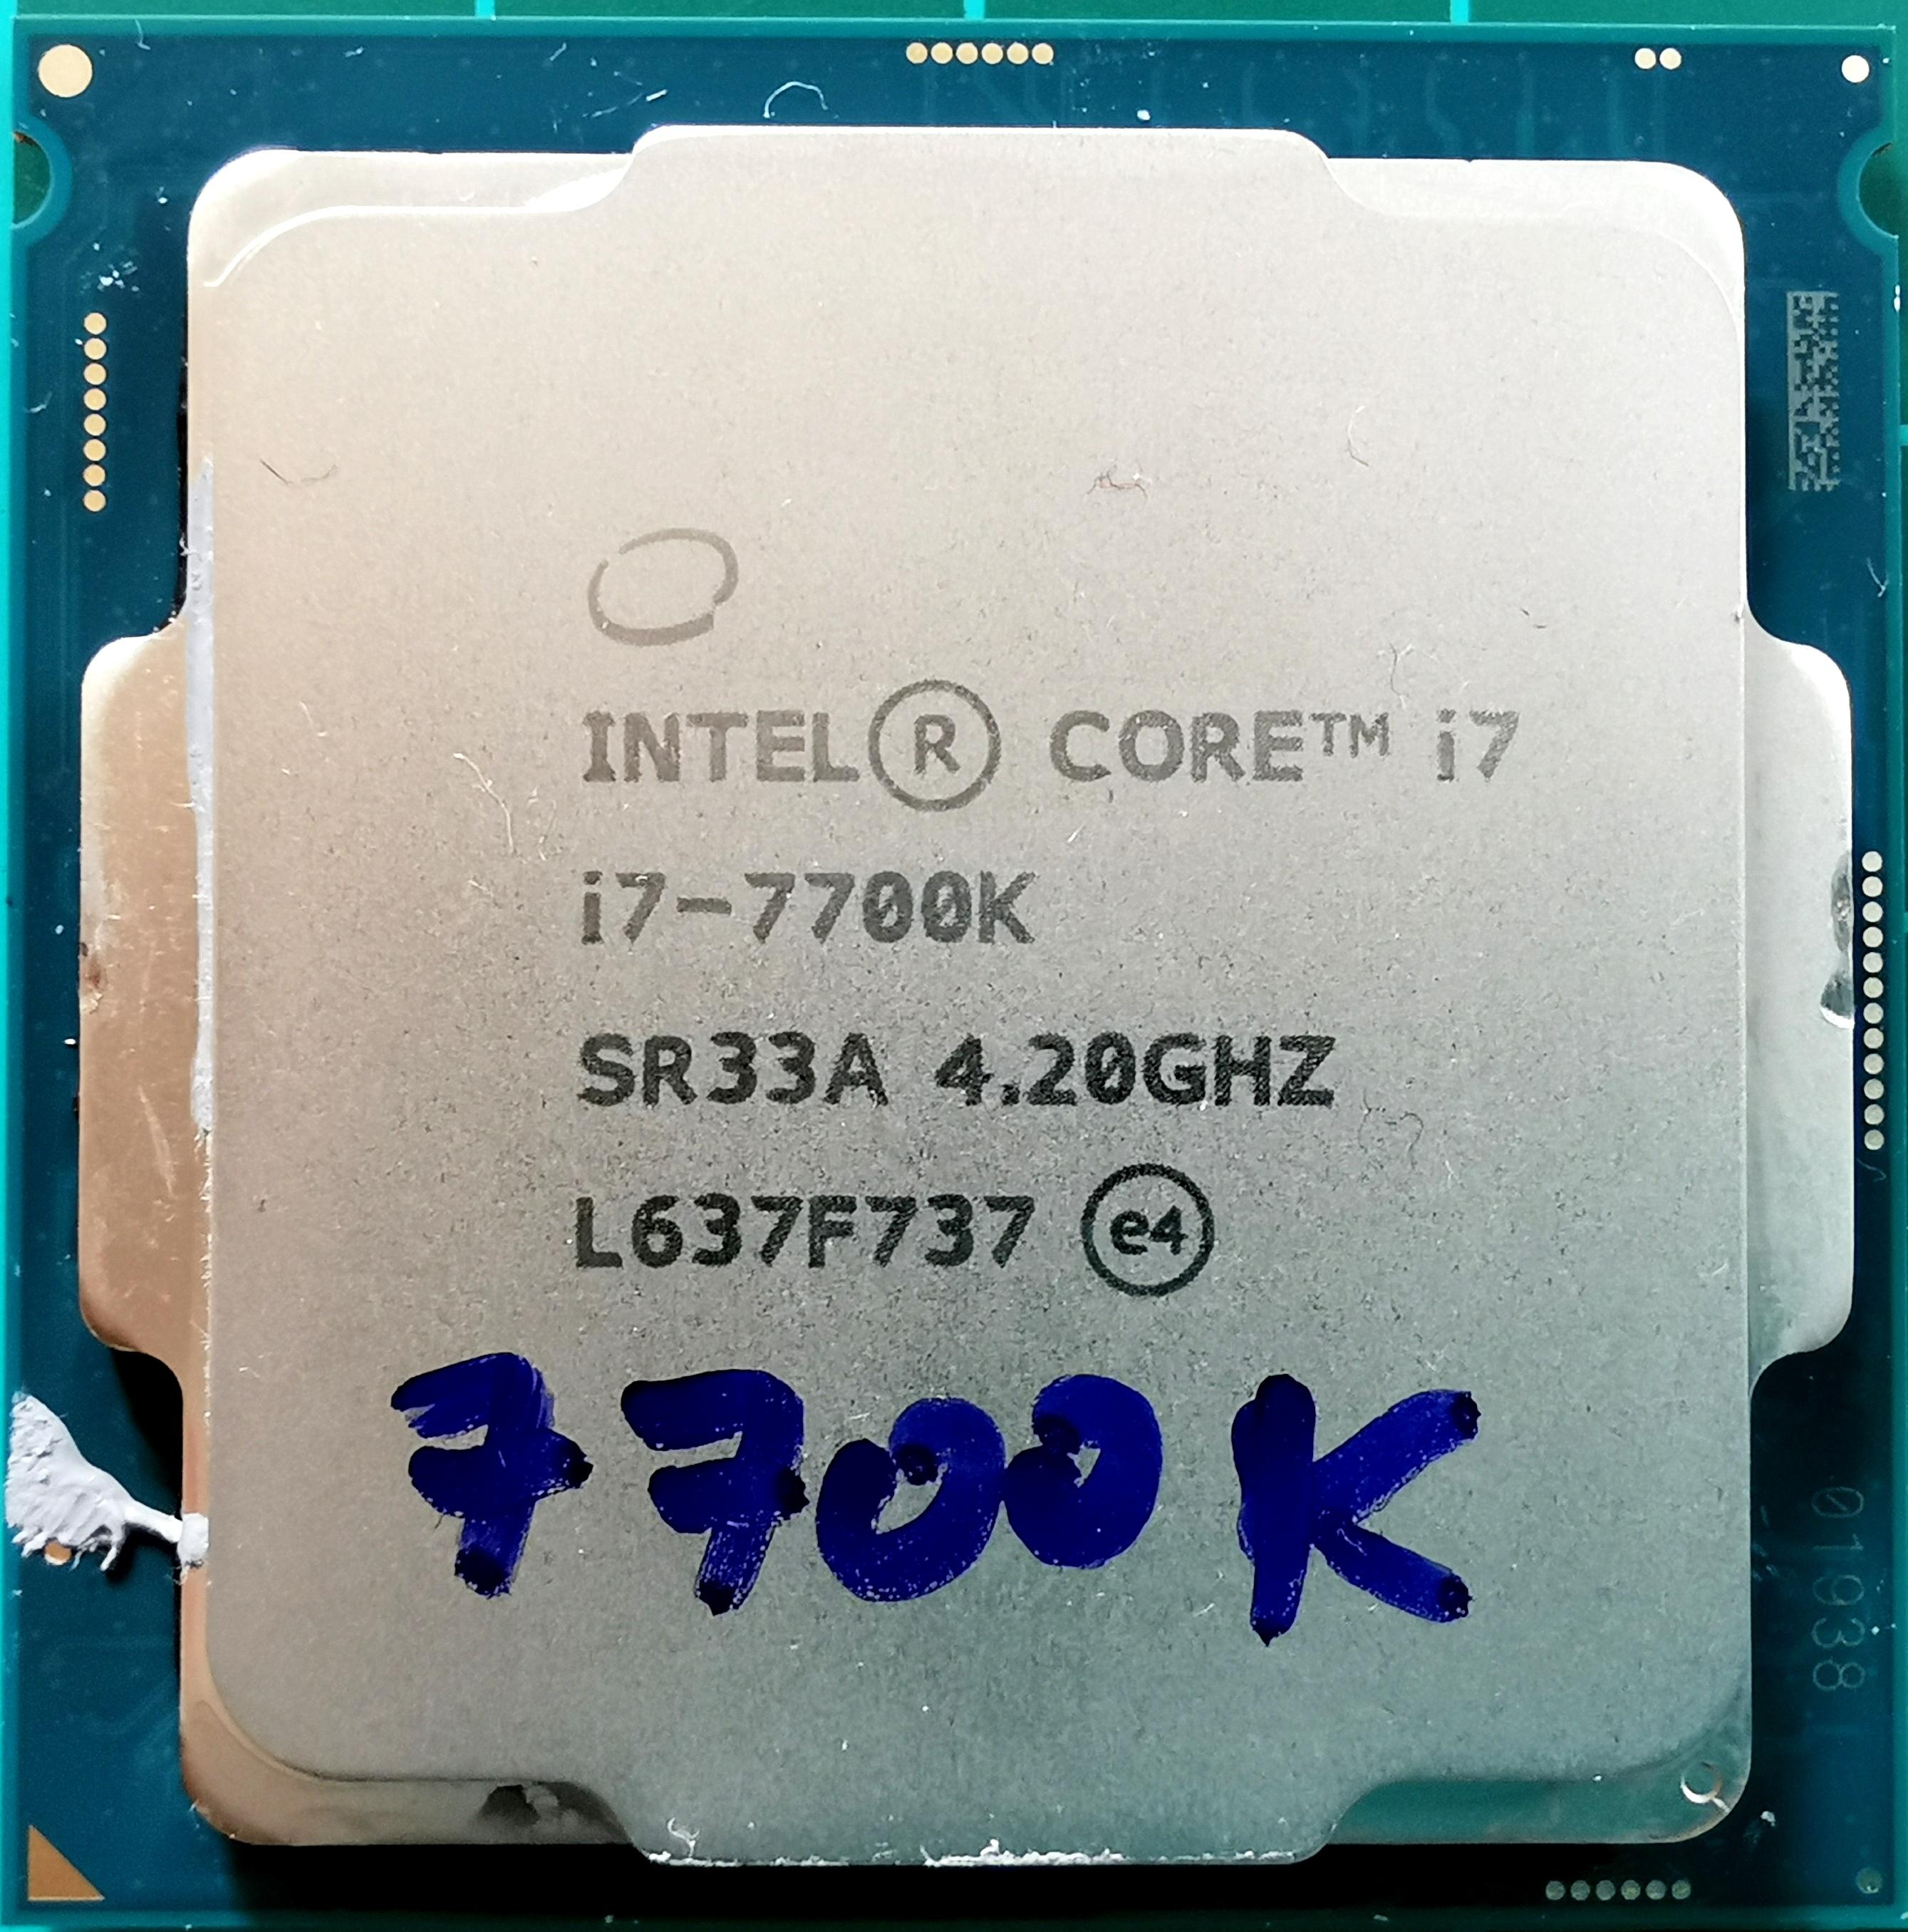 Upgrading from an Intel Core i7-2600K: Testing Sandy Bridge in 2019